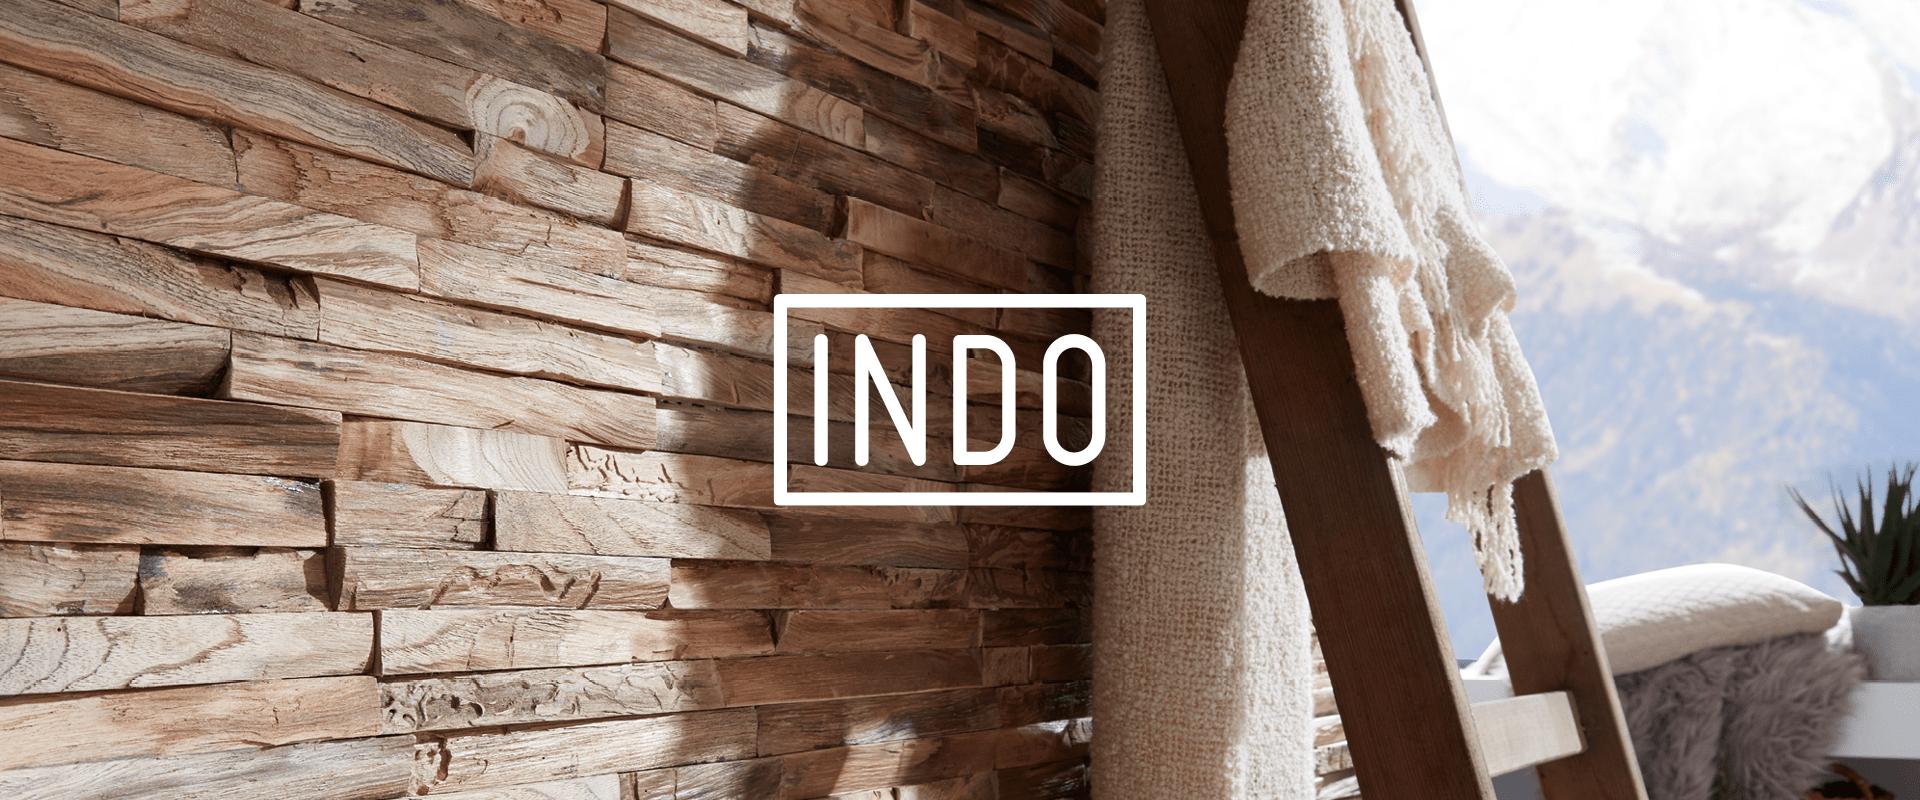 INDO Logo| Bodenversand24